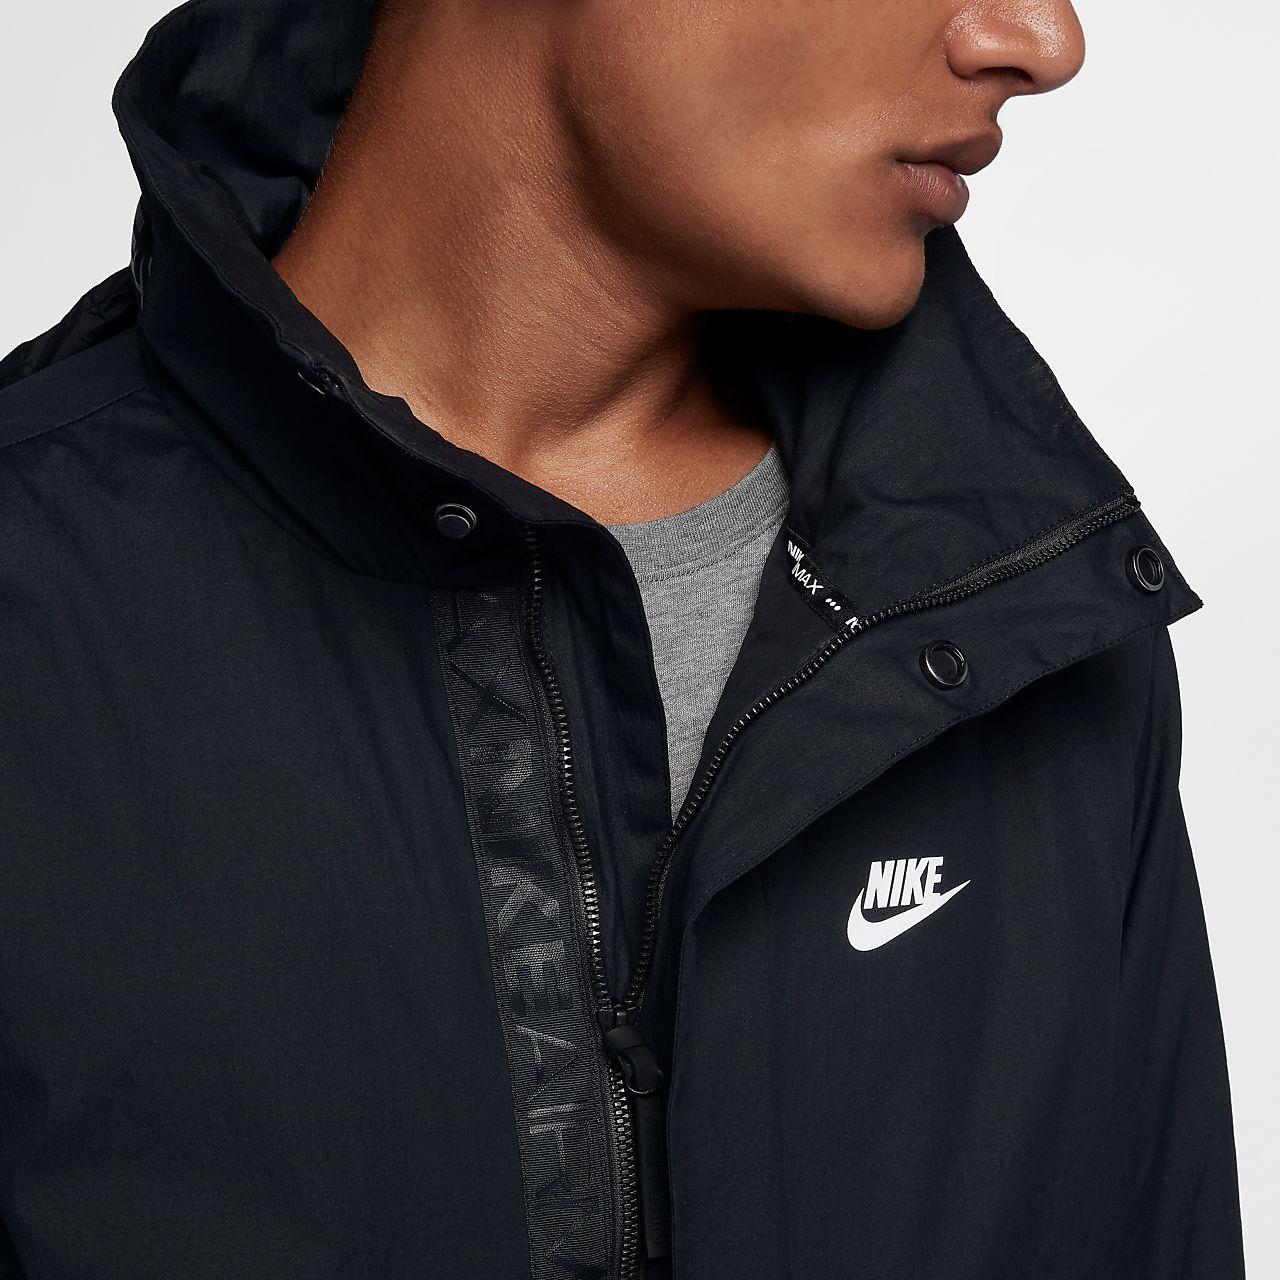 Wiyqxz Nike Parka Sportswear Sportswear Homme Homme Nike oWrdExBeQC